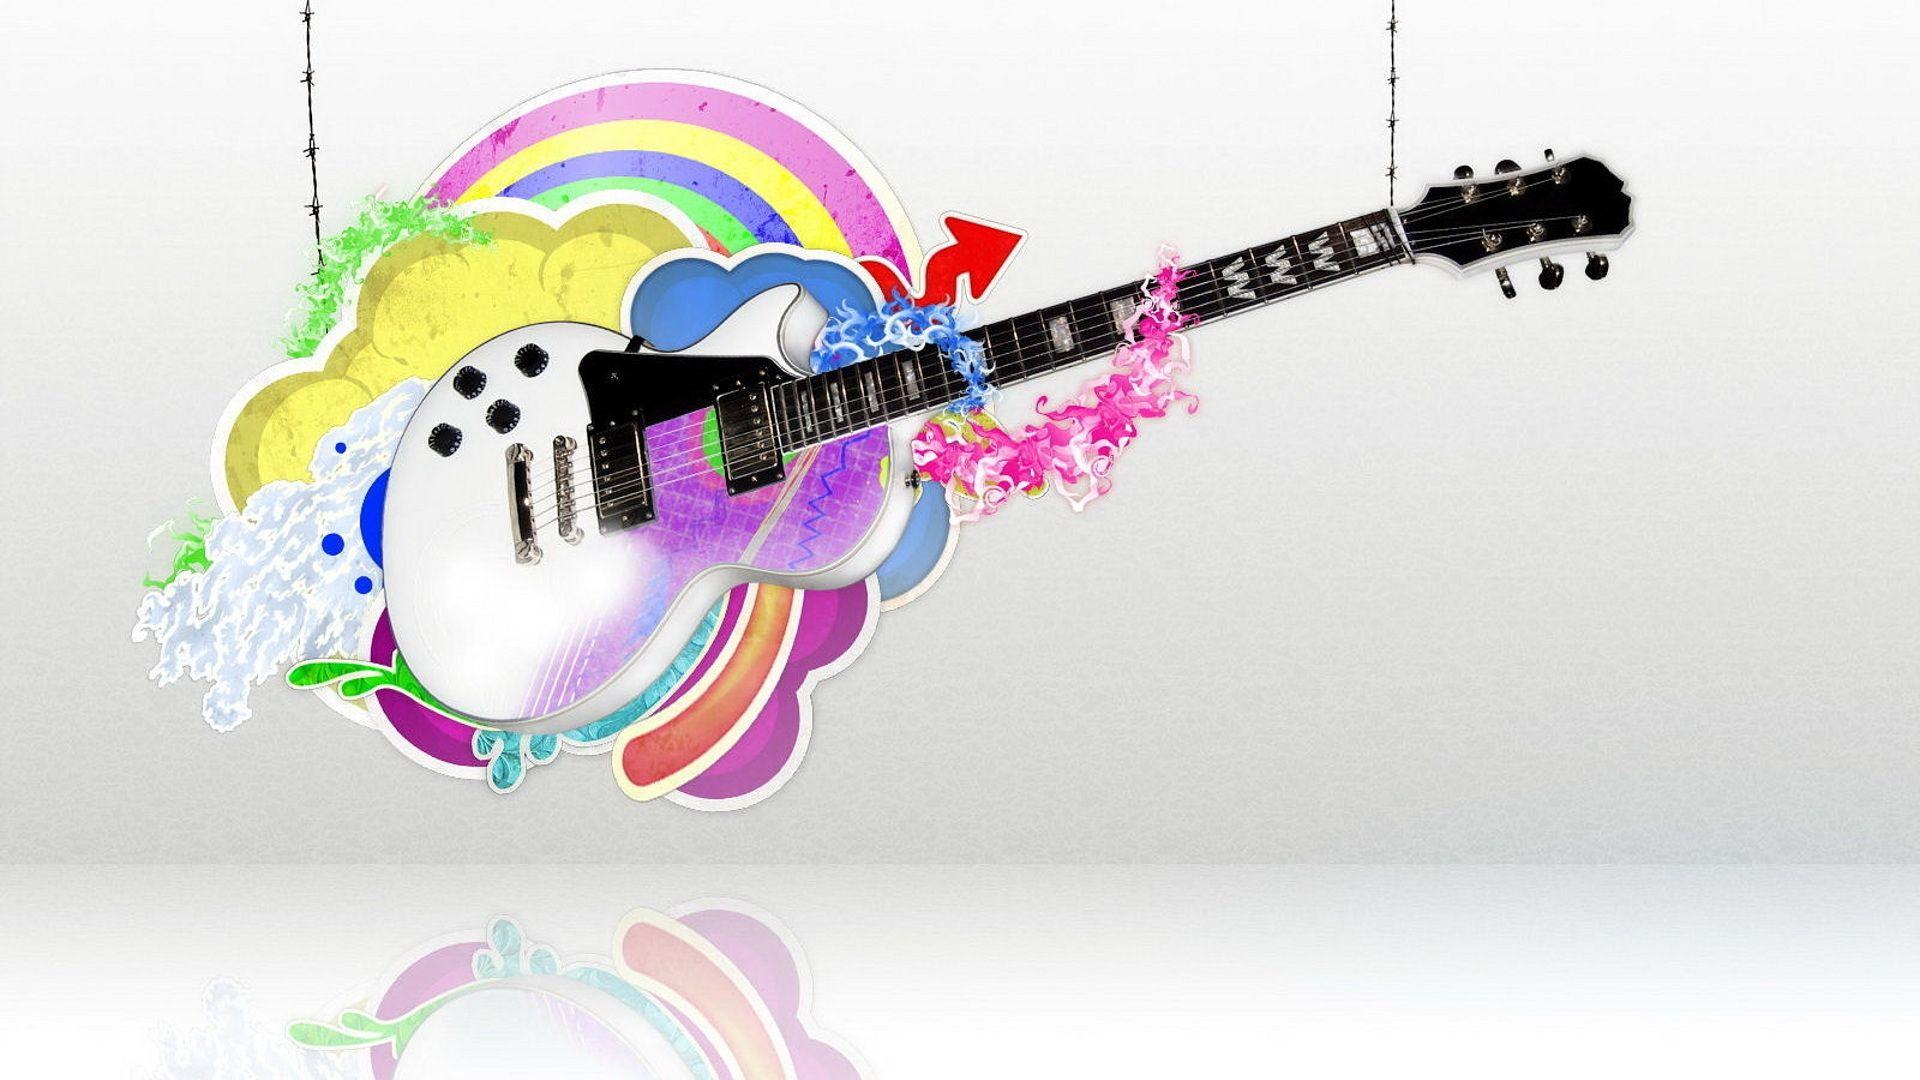 Guitar Abstract, 1080p Wallpaper